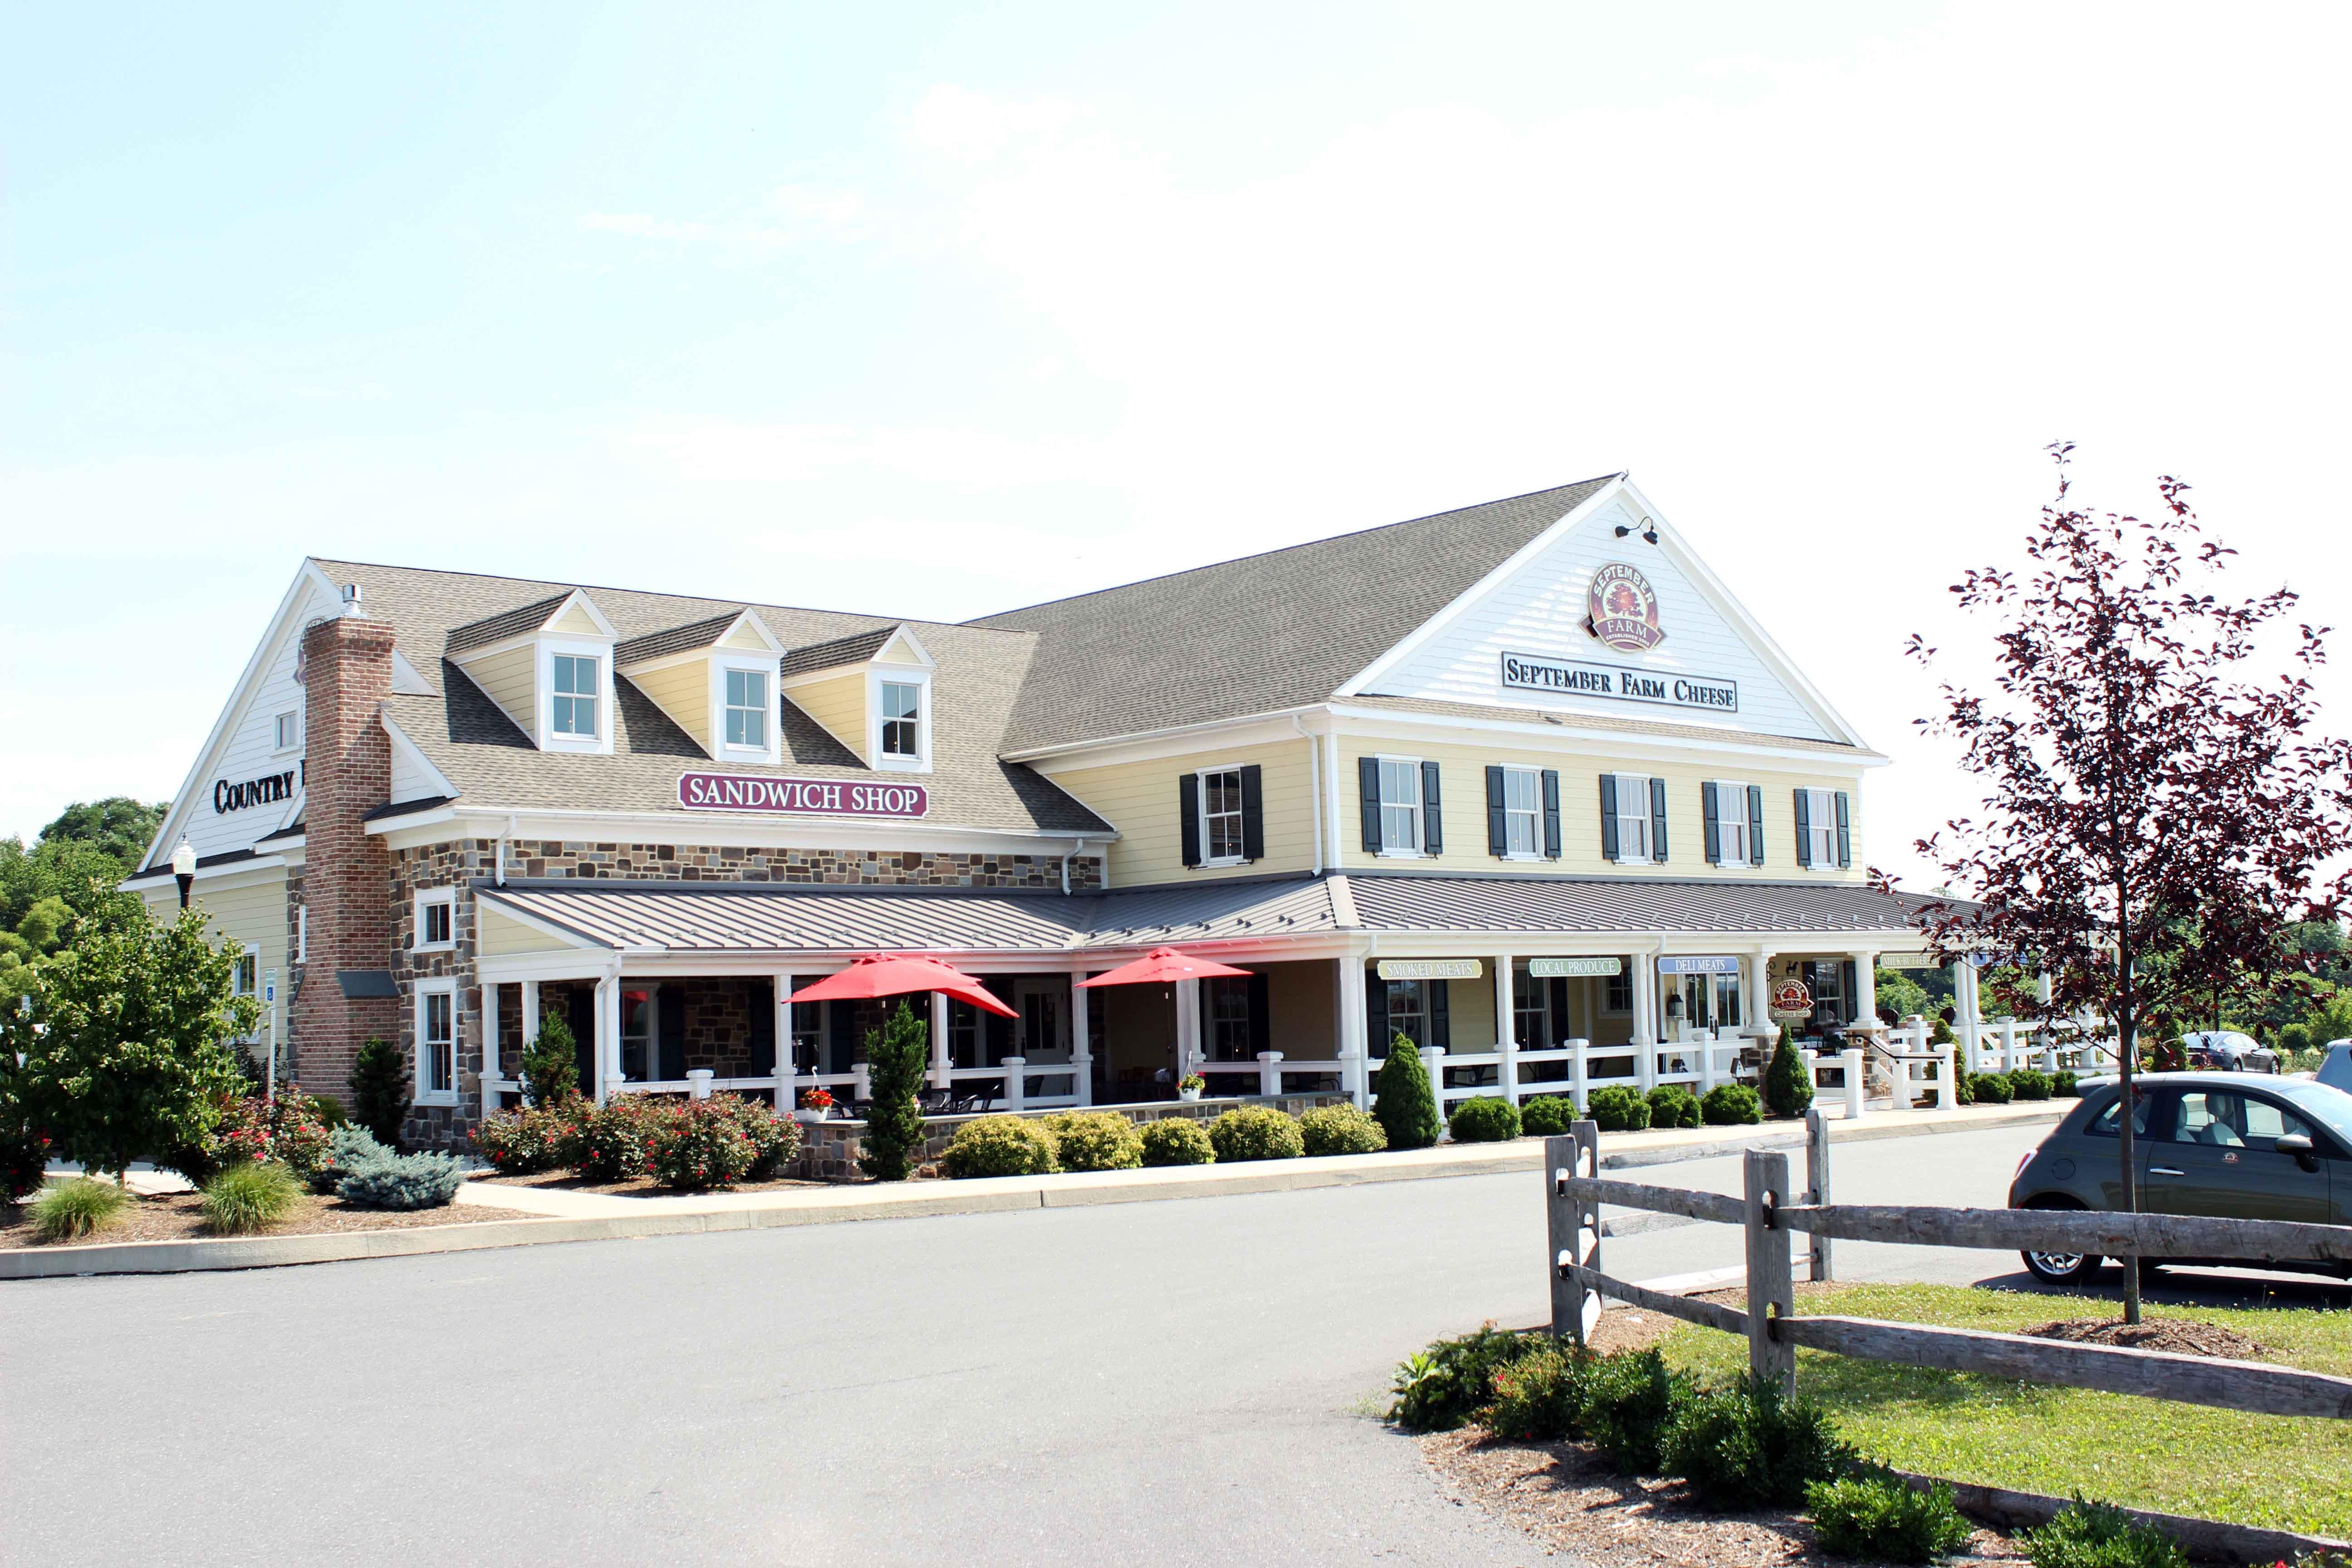 September Farm retail location in Honey Brook, PA